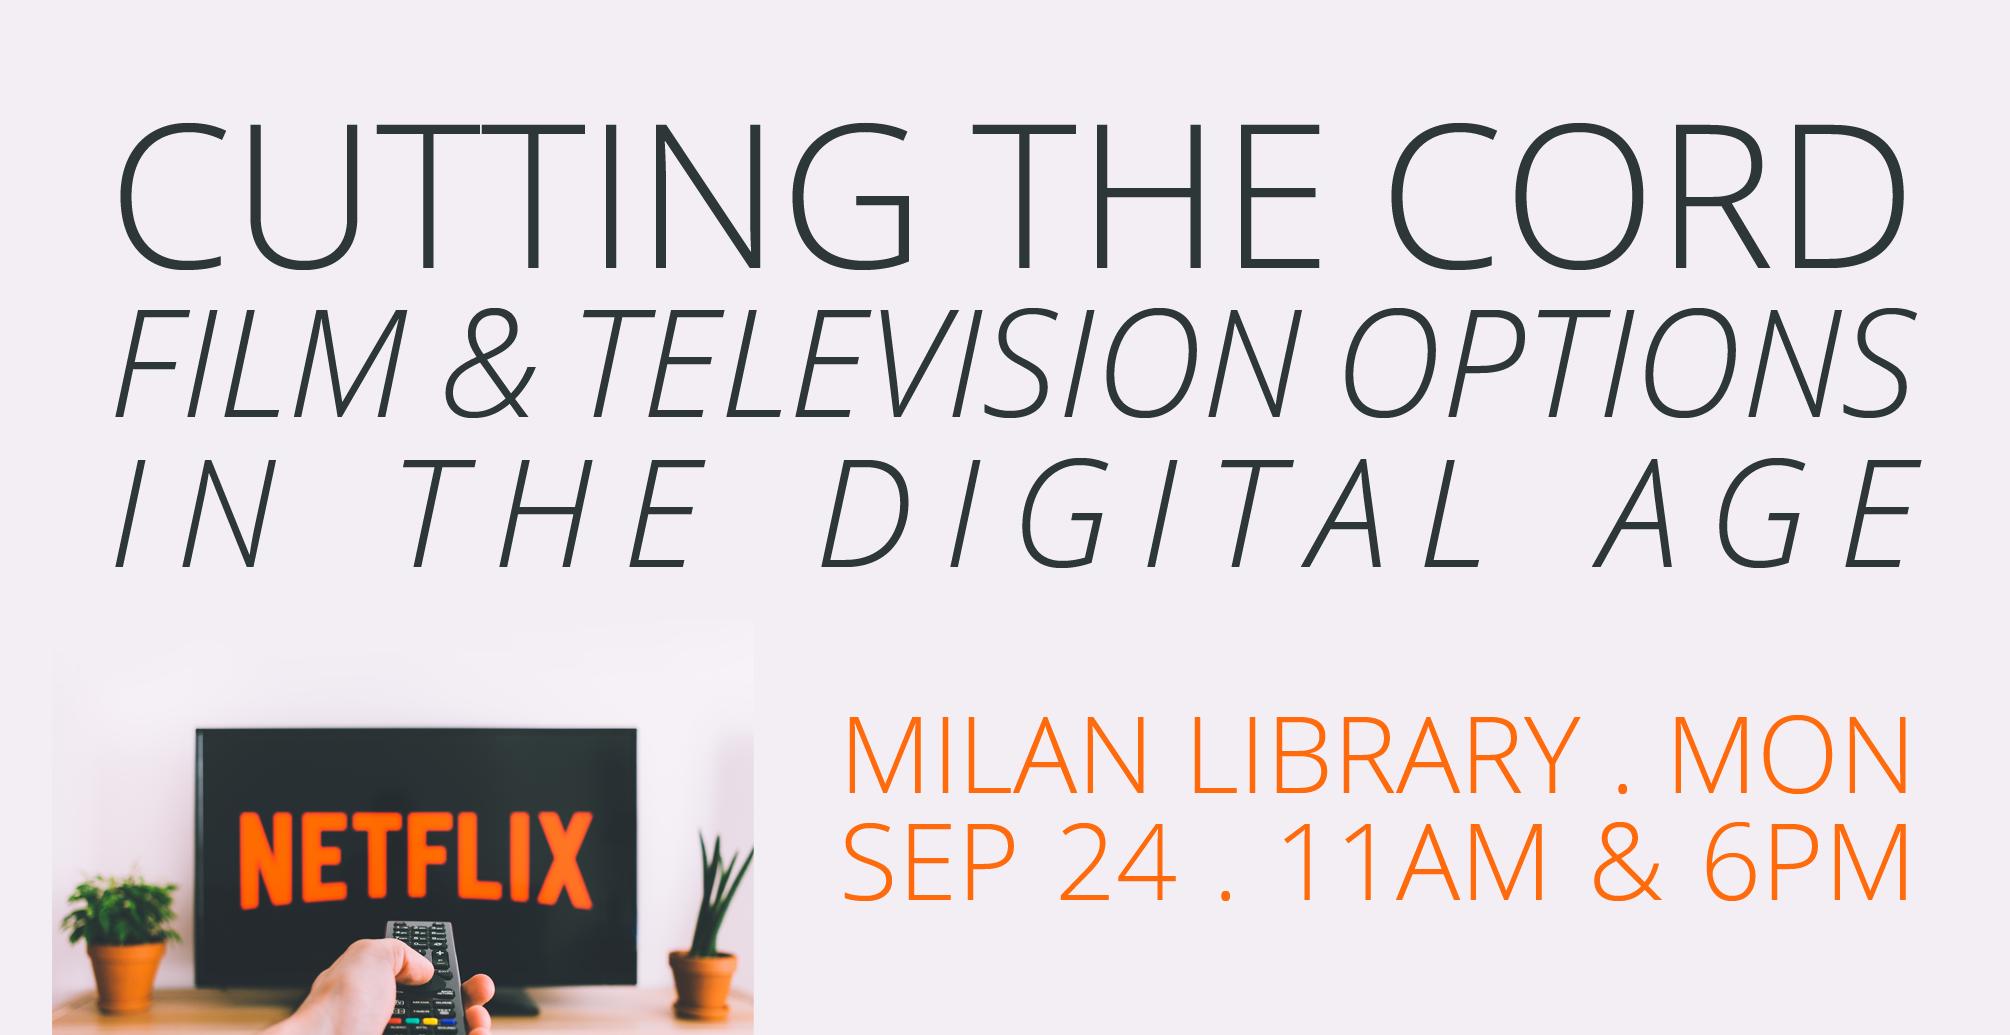 2018-09-TECH-Milan-Cutting-the-Cord-Slide